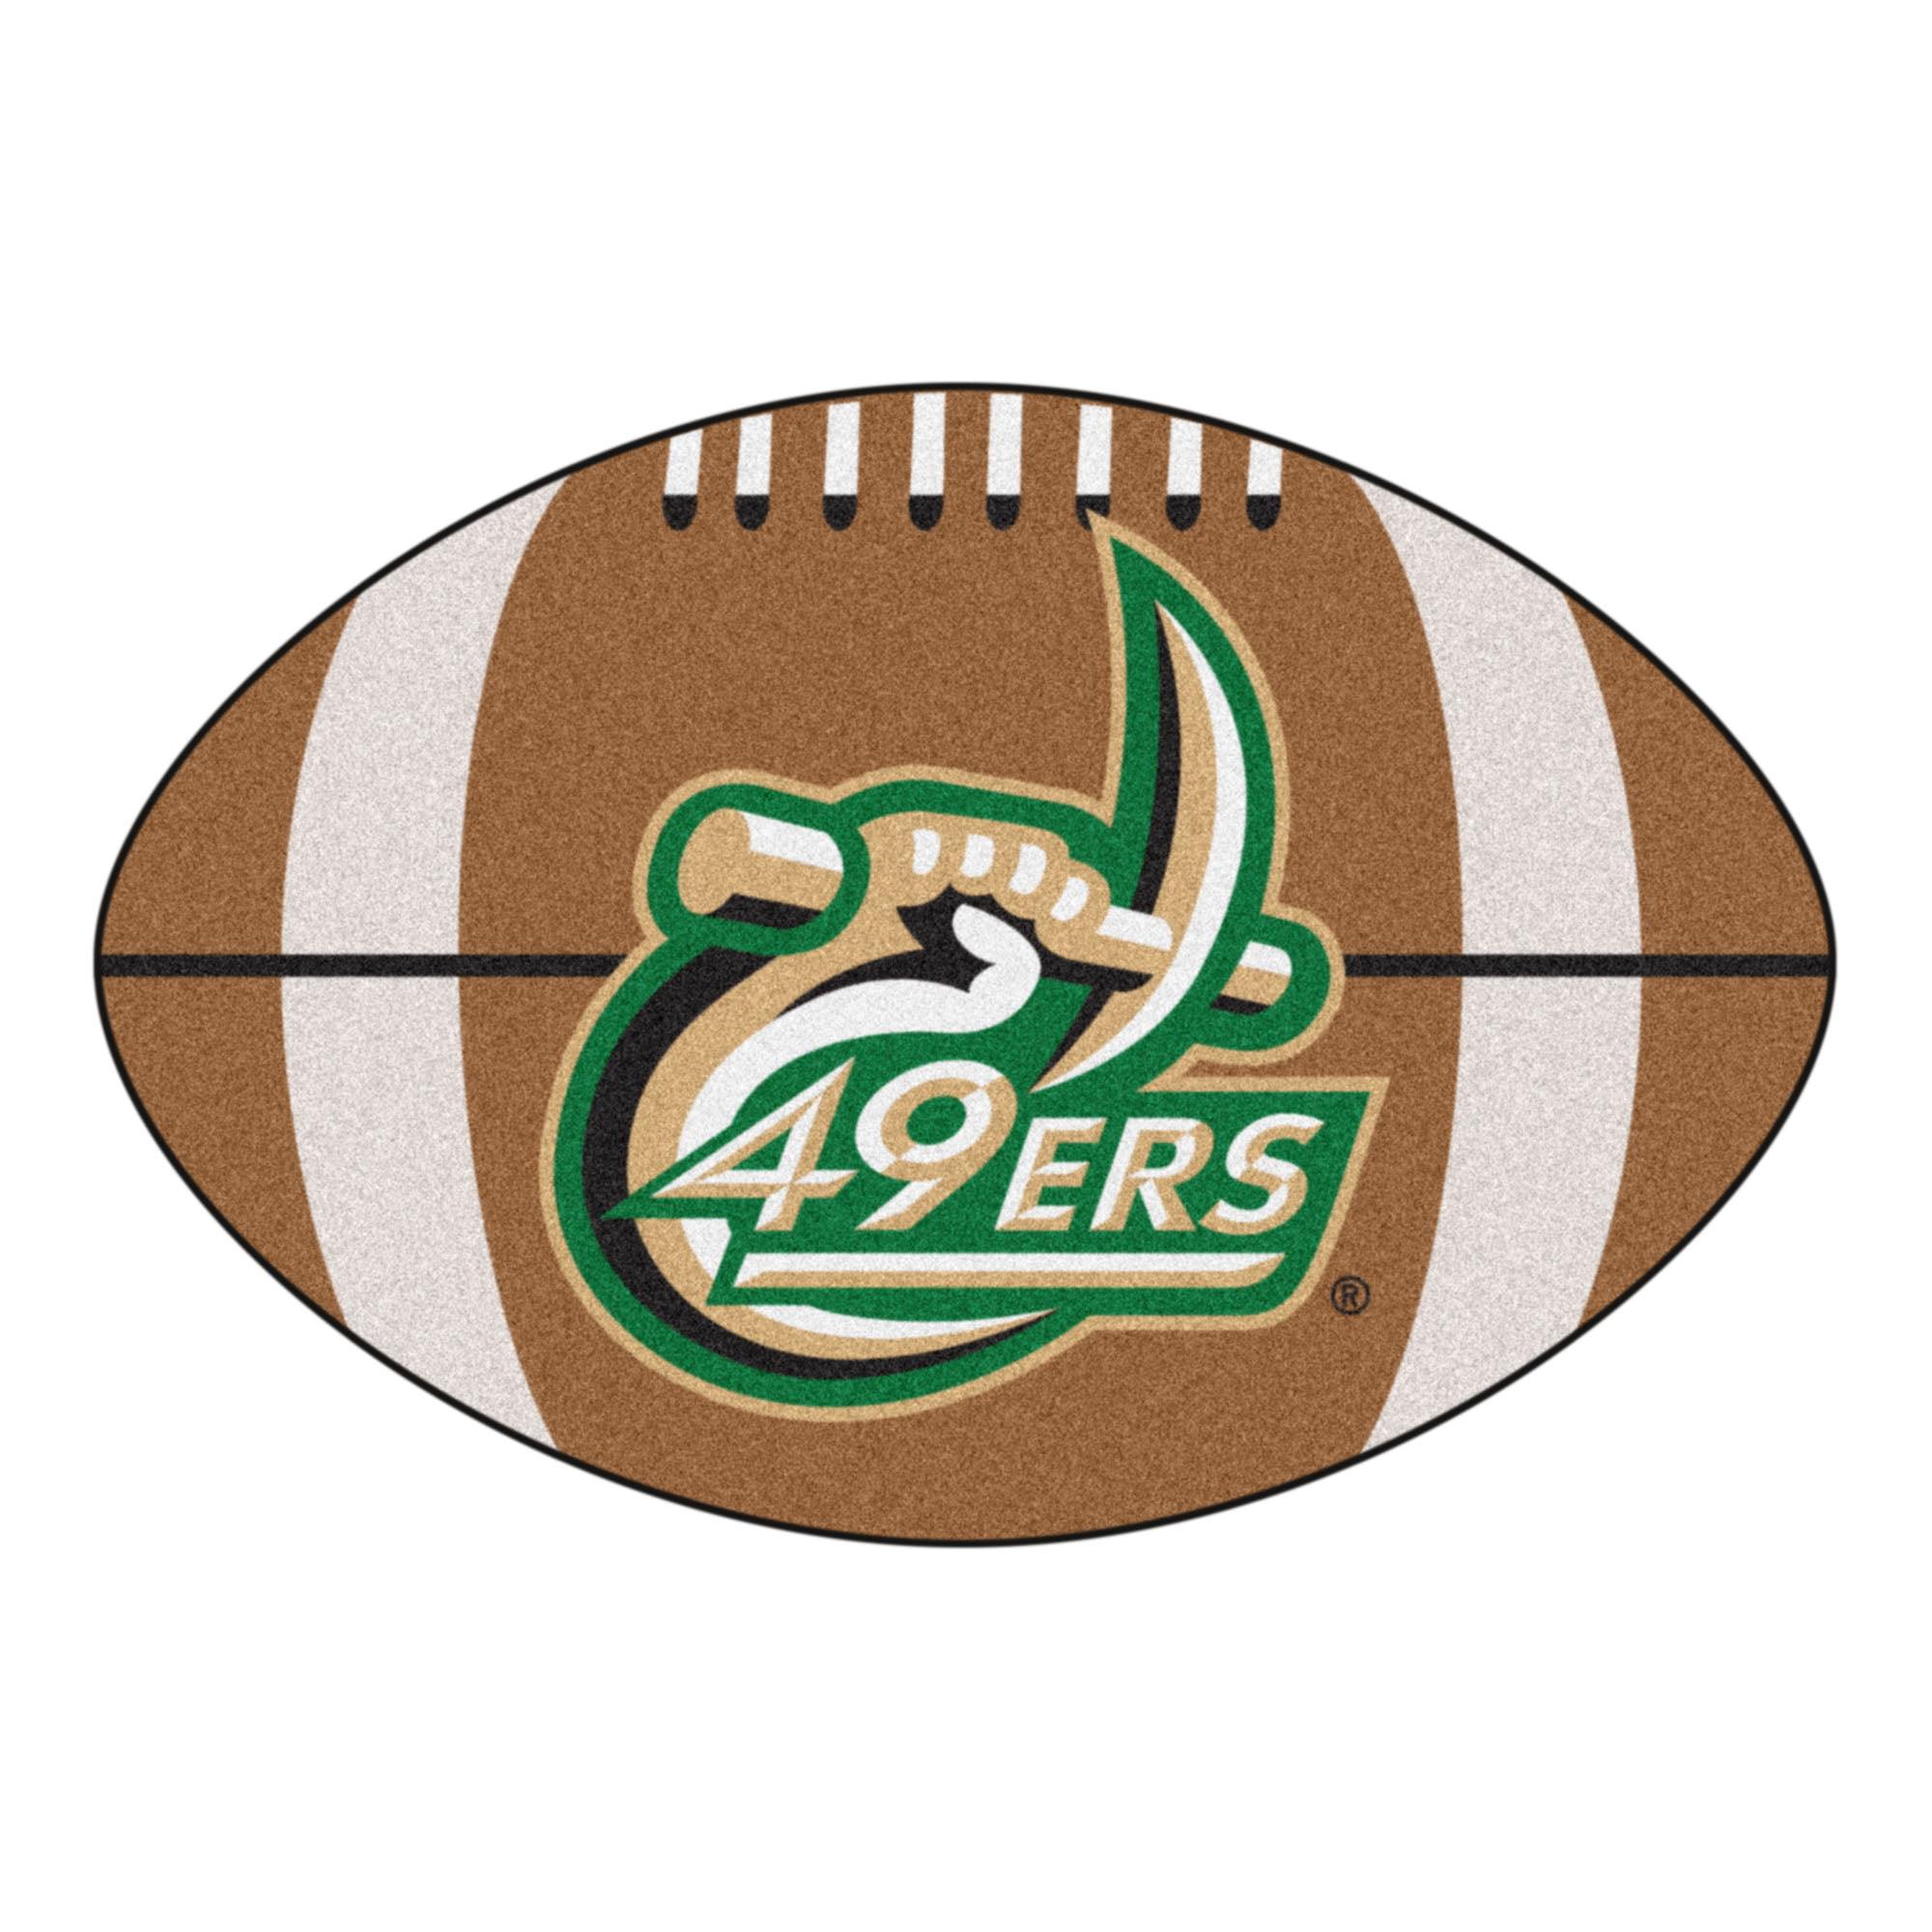 Ncaa University Of North Carolina Charlotte Forty Niners Football Shaped Mat Area Rug Walmart Com Walmart Com